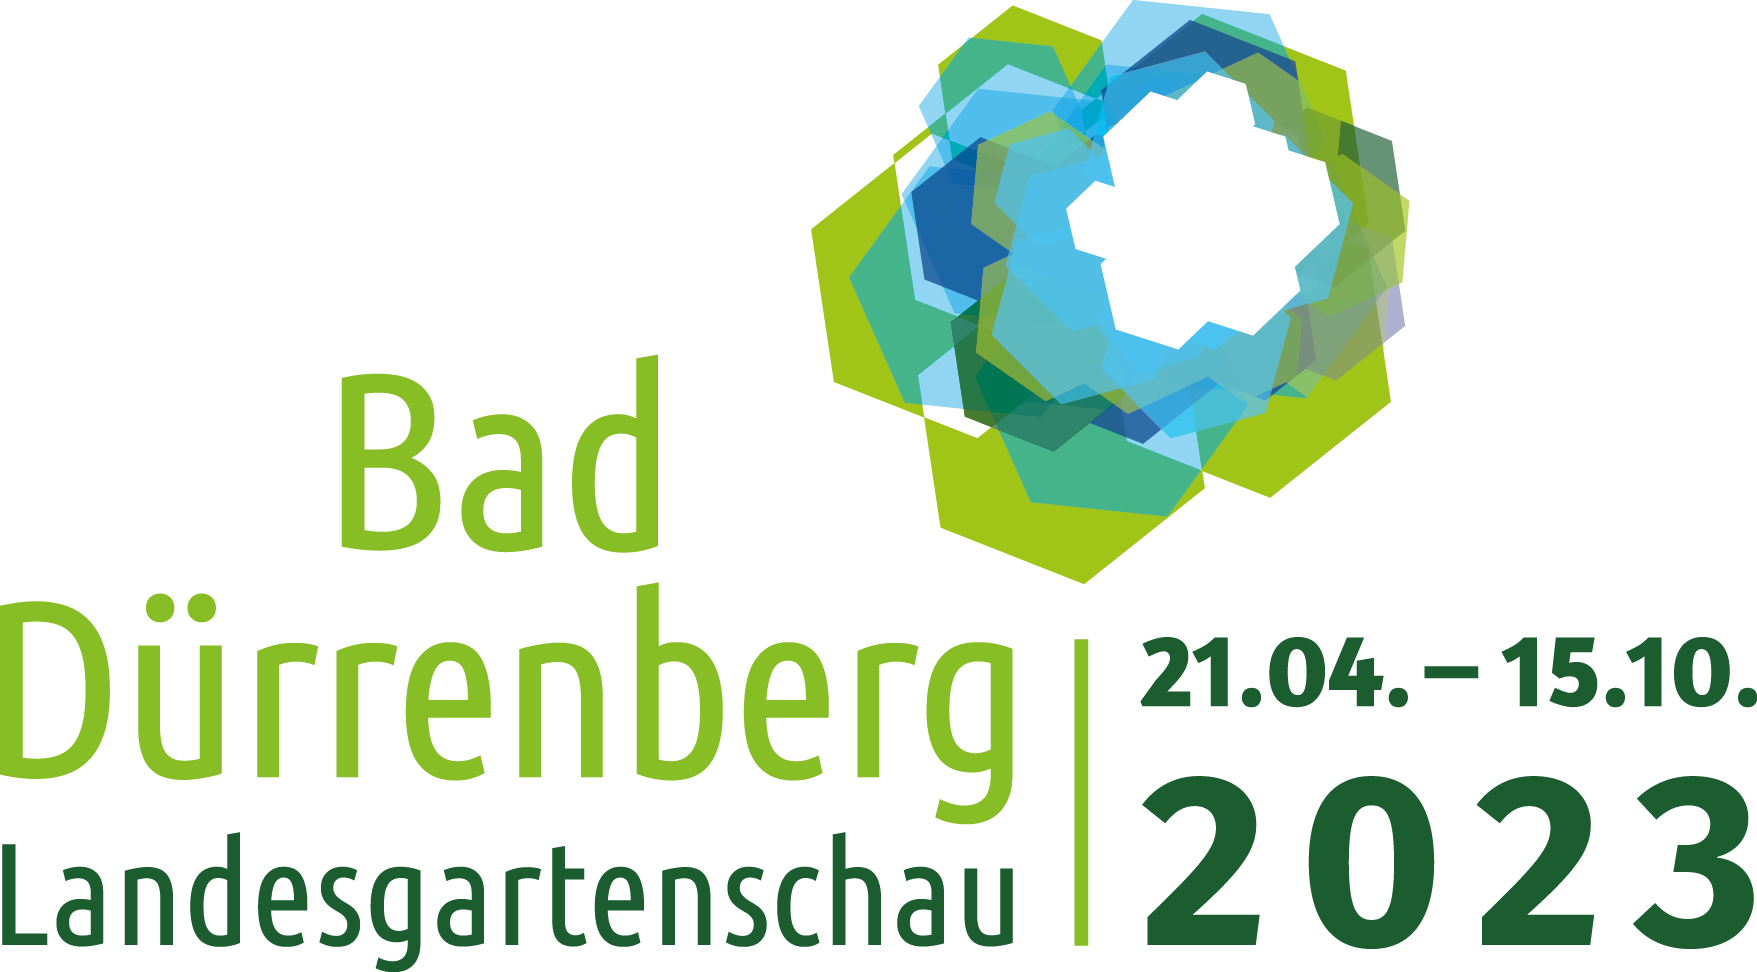 Landesgartenschau Bad Dürrenberg 2023 gGmbH